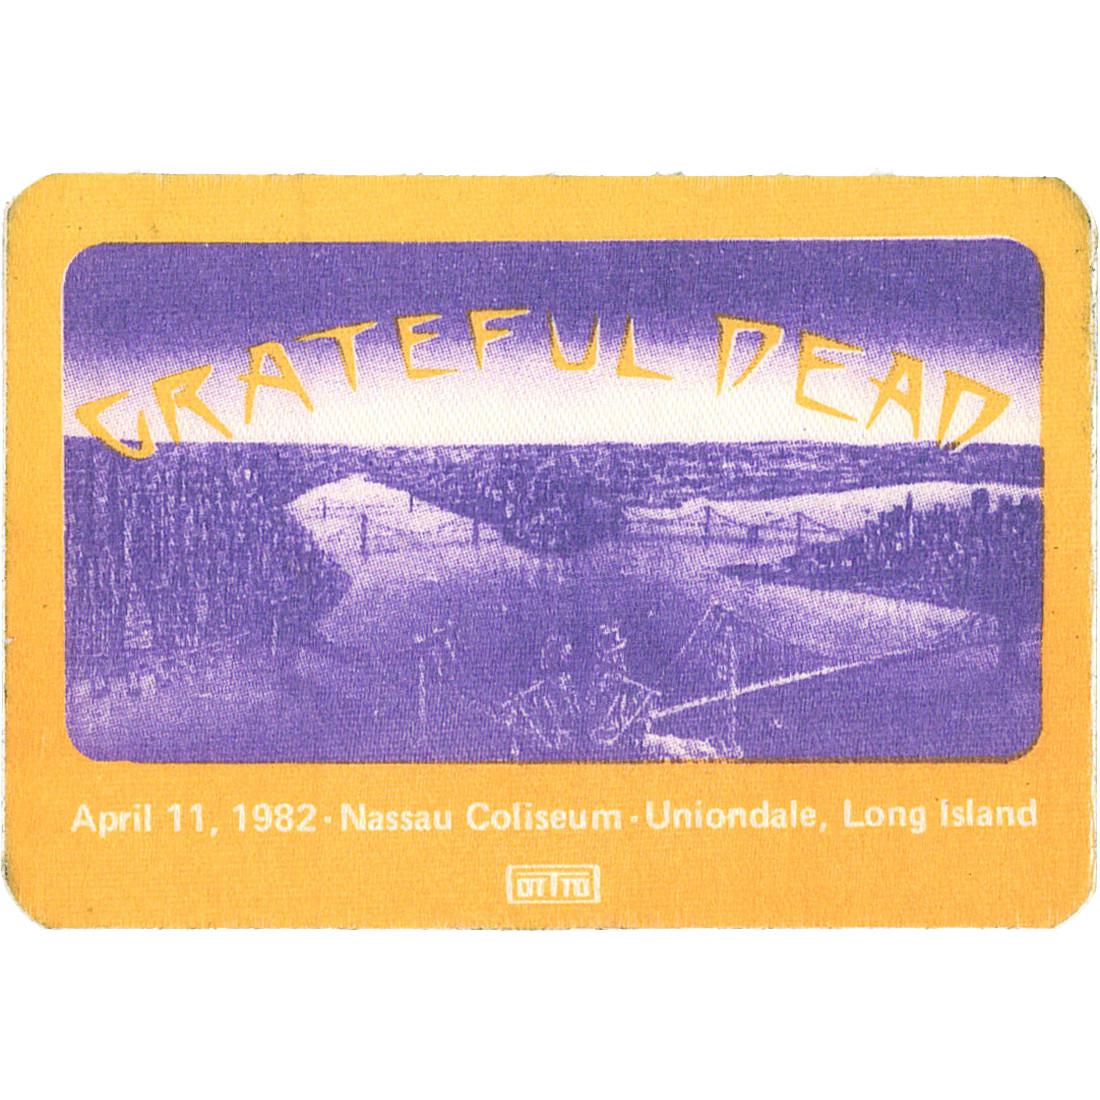 Grateful Dead 1982 04-11 Backstage Pass